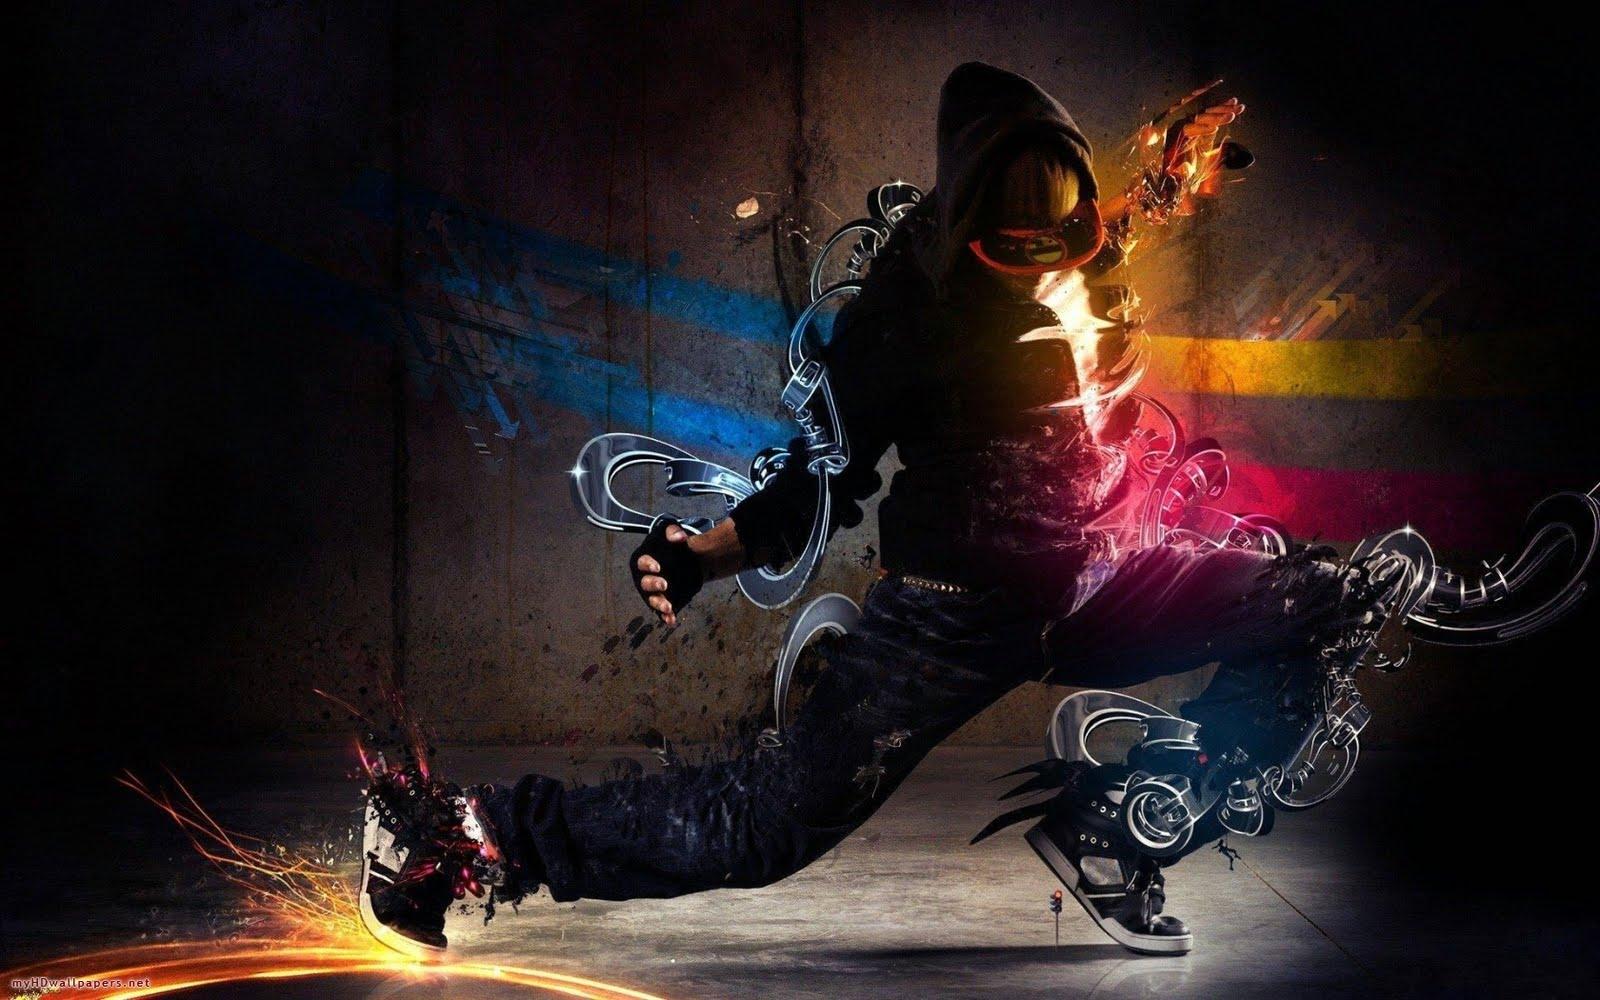 http://2.bp.blogspot.com/-AEHeCTPHkzI/TtxmlOTruxI/AAAAAAAAAzA/uF3qVNyJ5sk/s1600/dance-wallpaper-hd-1-728565.jpg